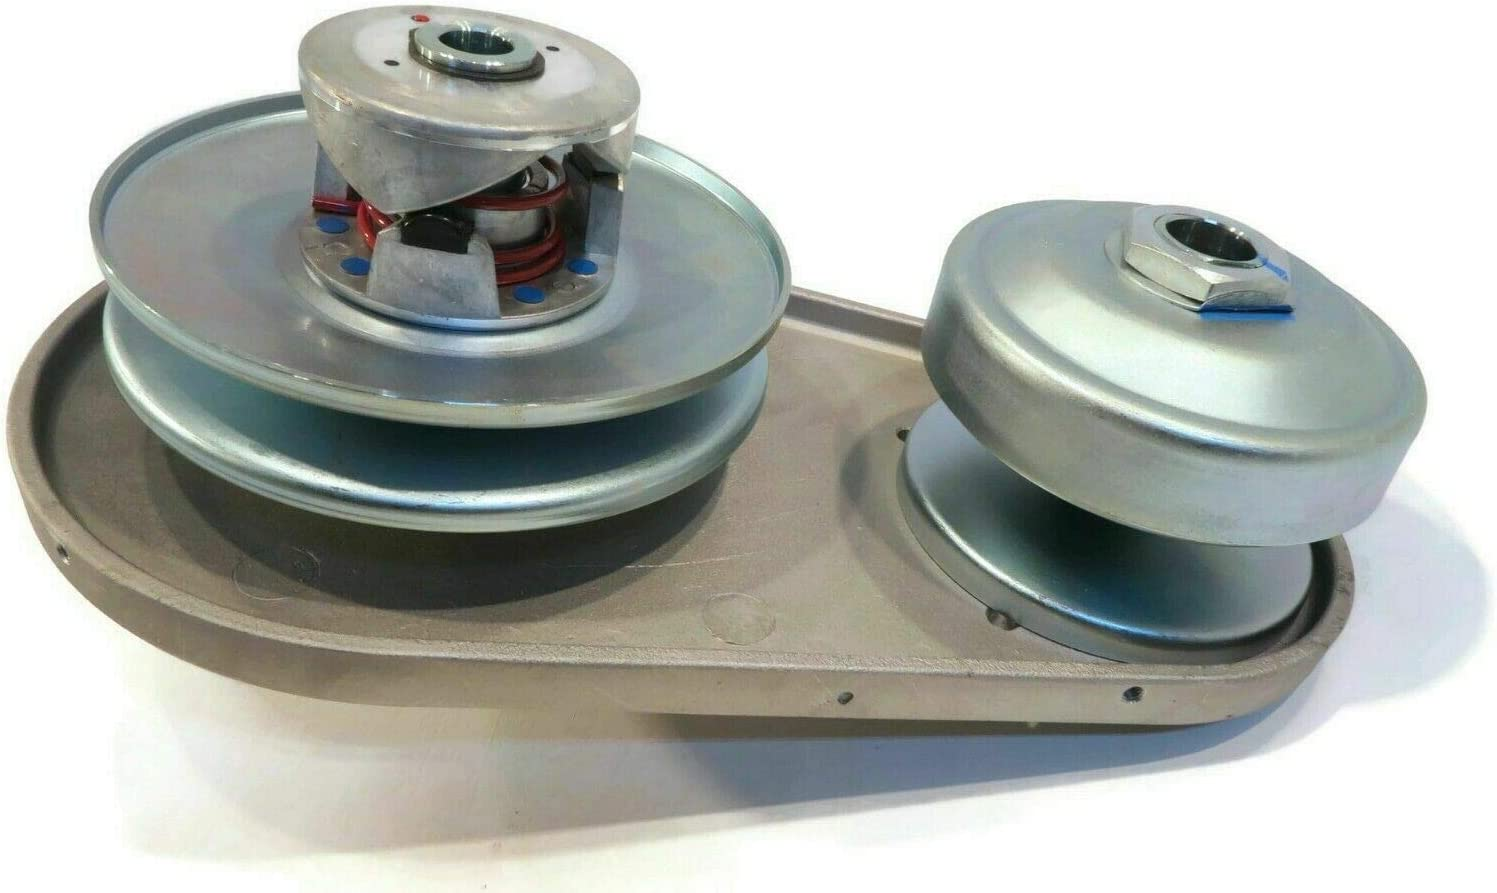 1//4 Keyway 40 Series Torque Converter Kit for 13HP Engines with 1 Crankshaft The ROP Shop